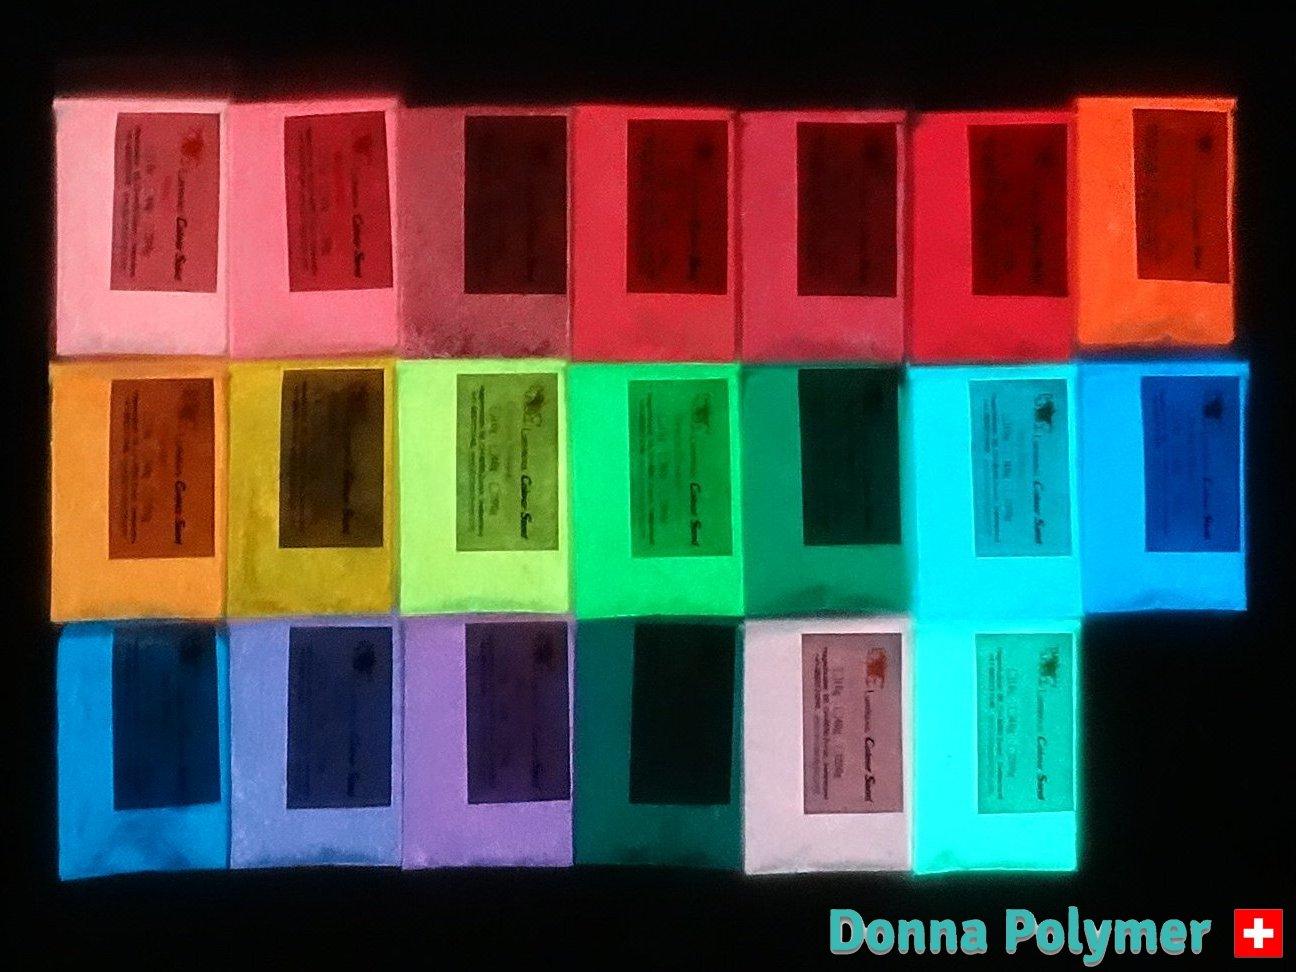 Donna 1296 Dsc03477_Sunlight_Small